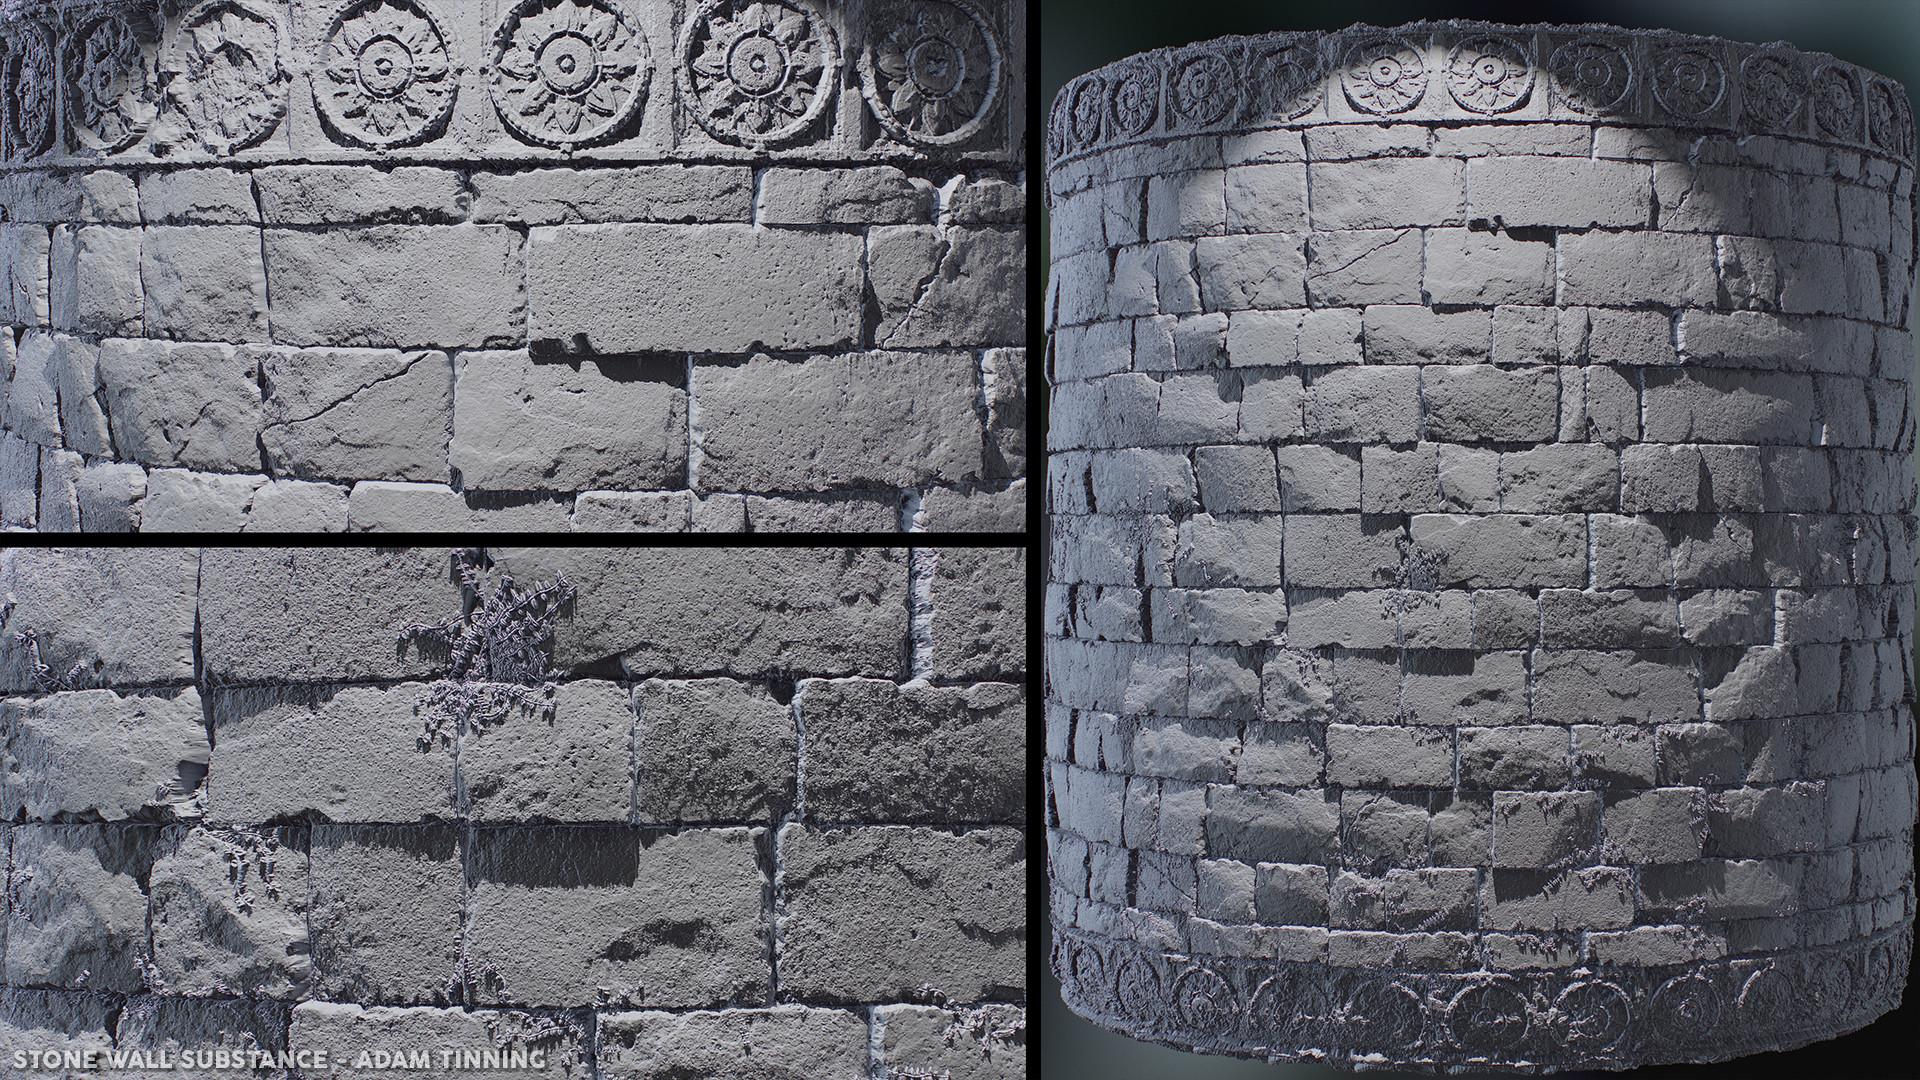 Adam tinning stonewall render 01